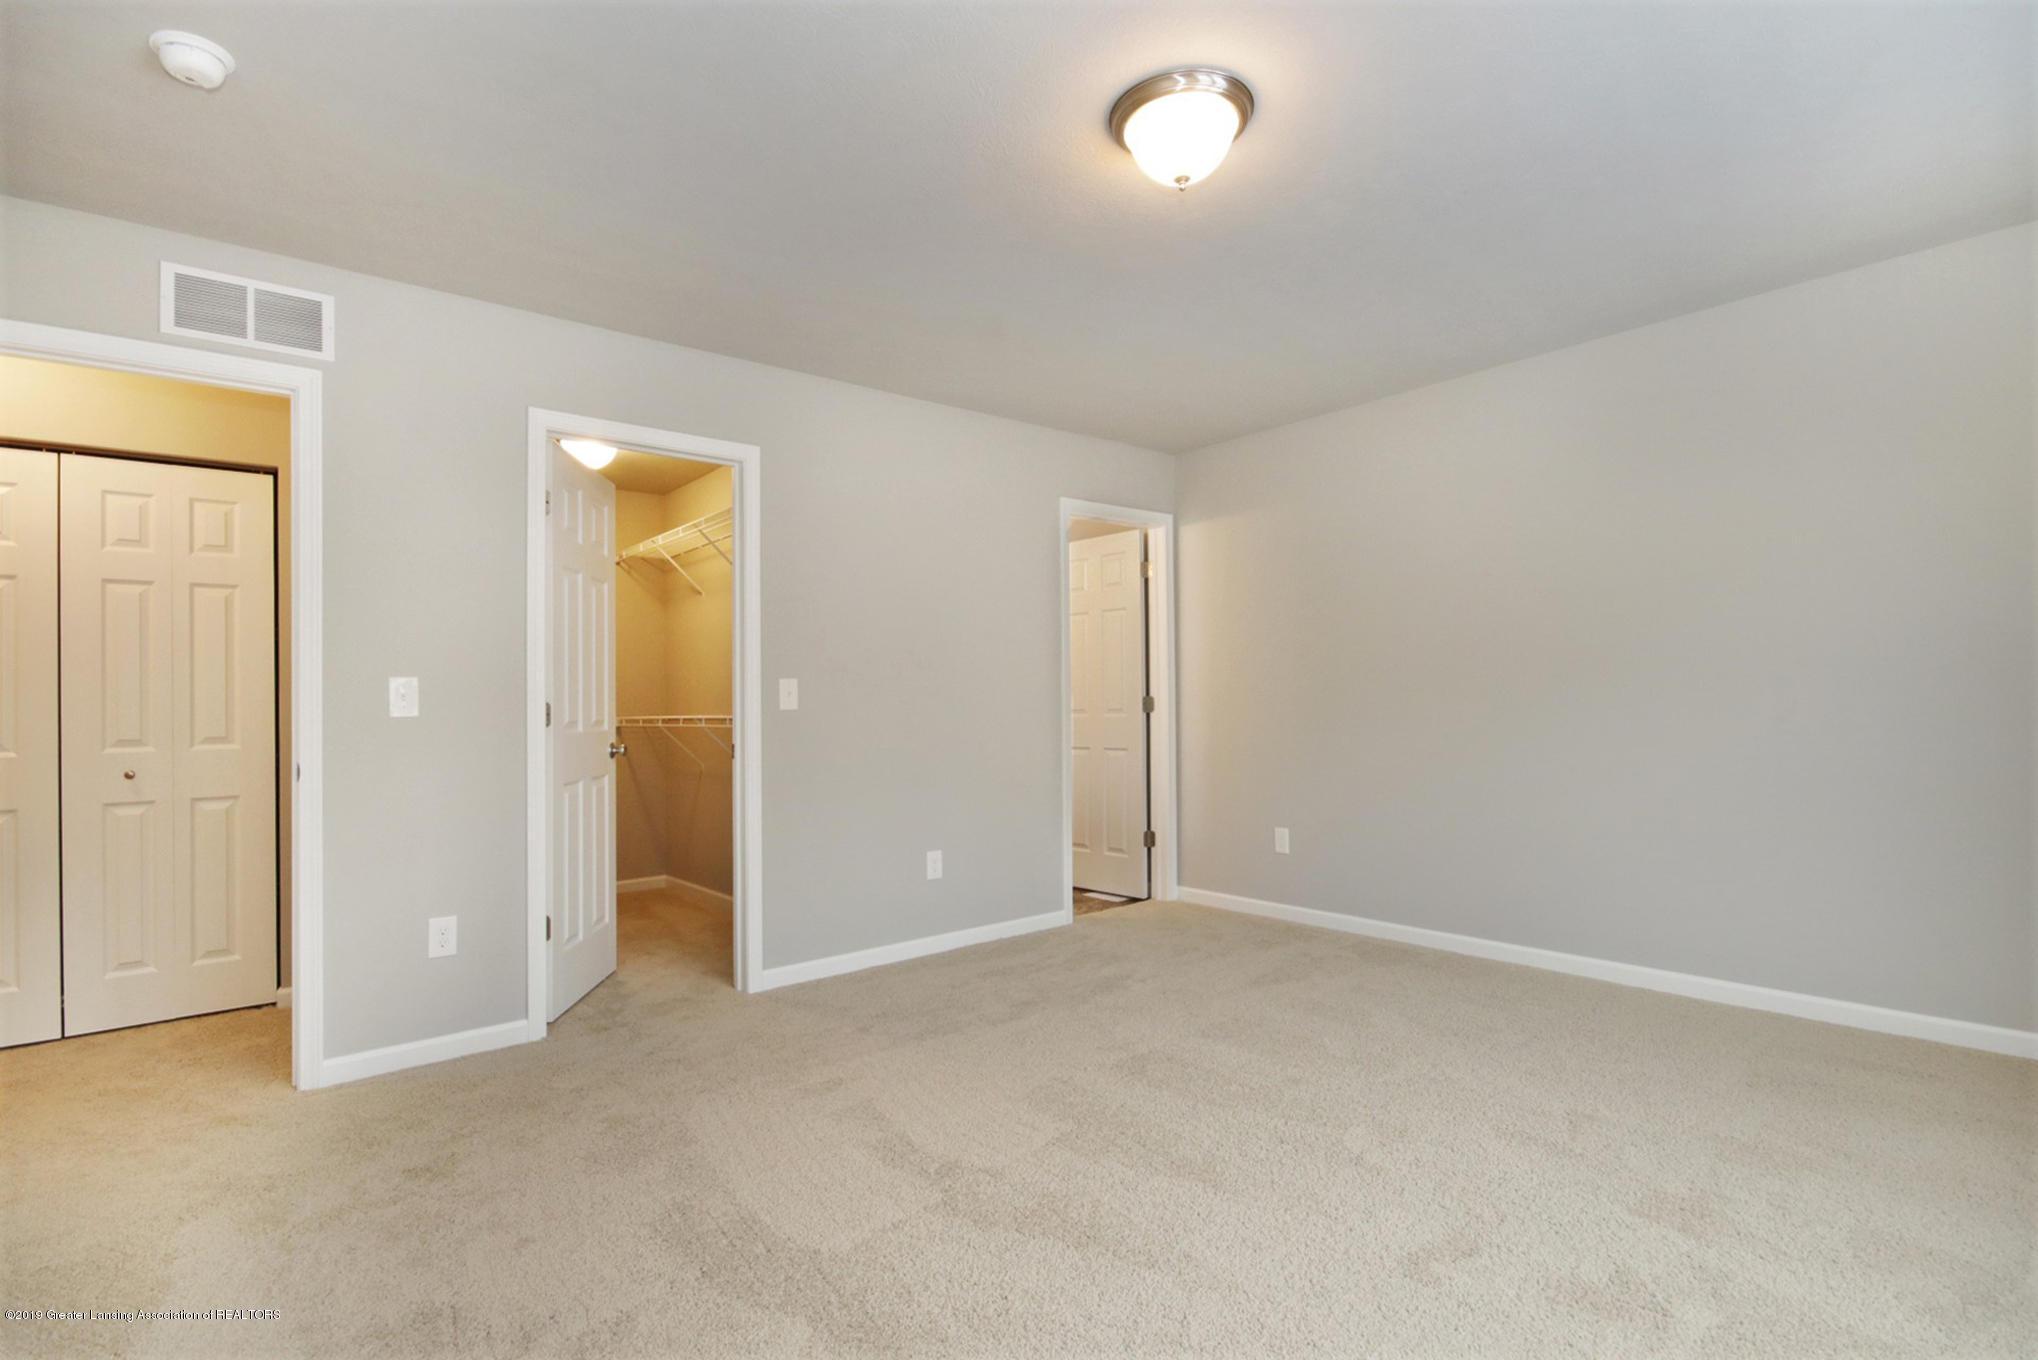 14171 Cordaleigh Dr - GSC035-E1600 Master Bedroom2 - 10